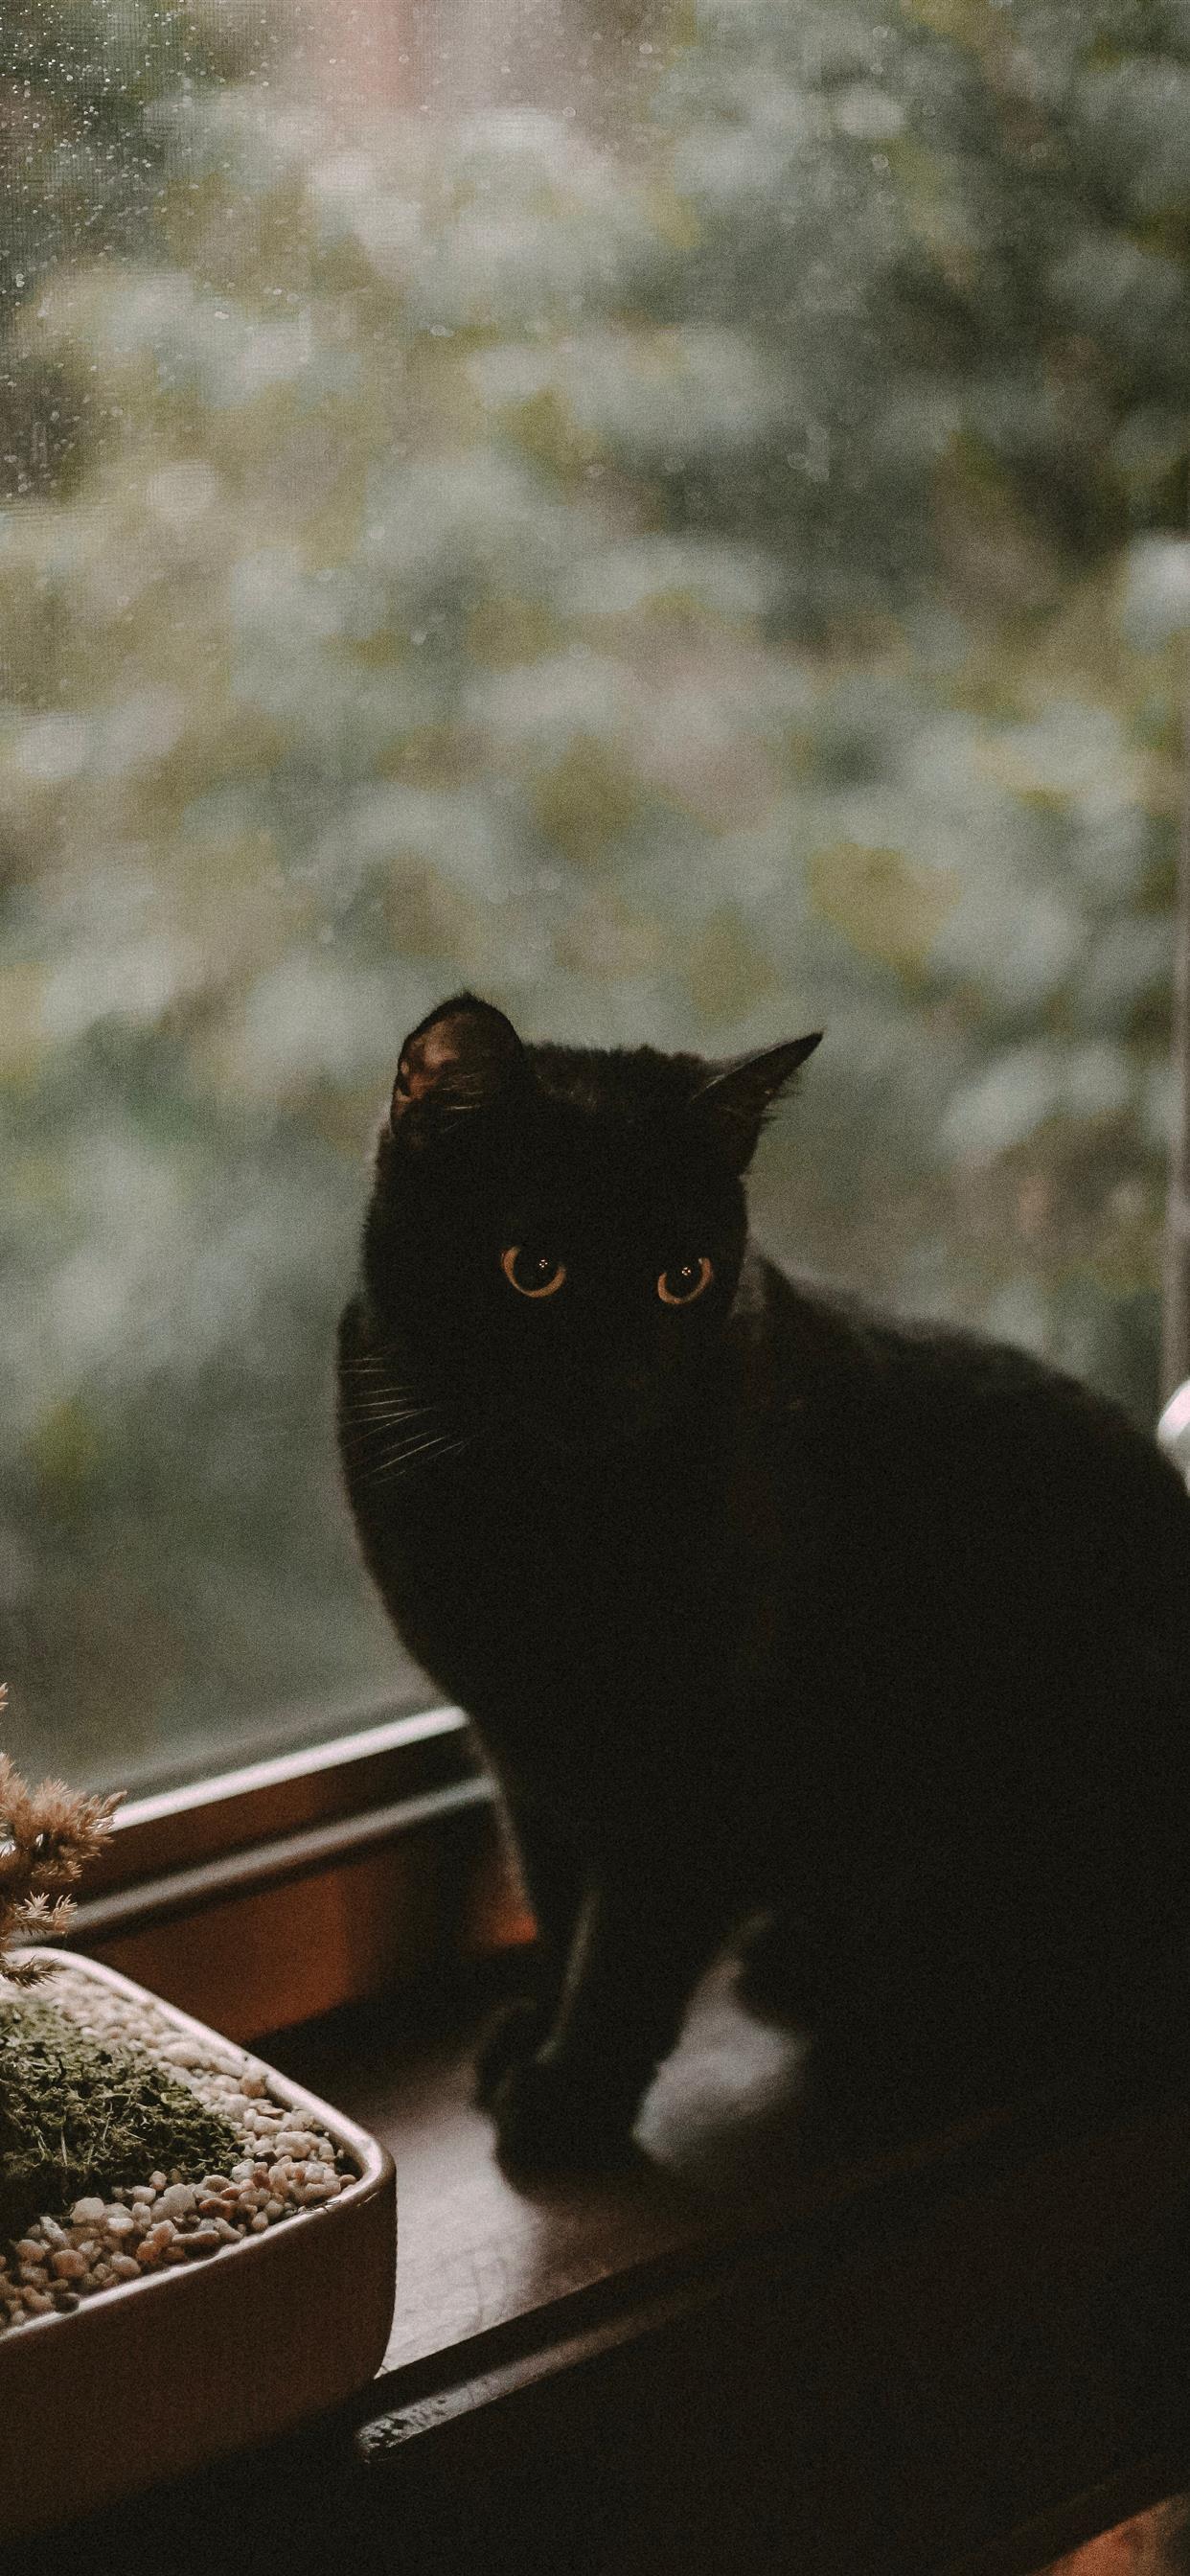 Black Cat Iphone Wallpapers Free Download